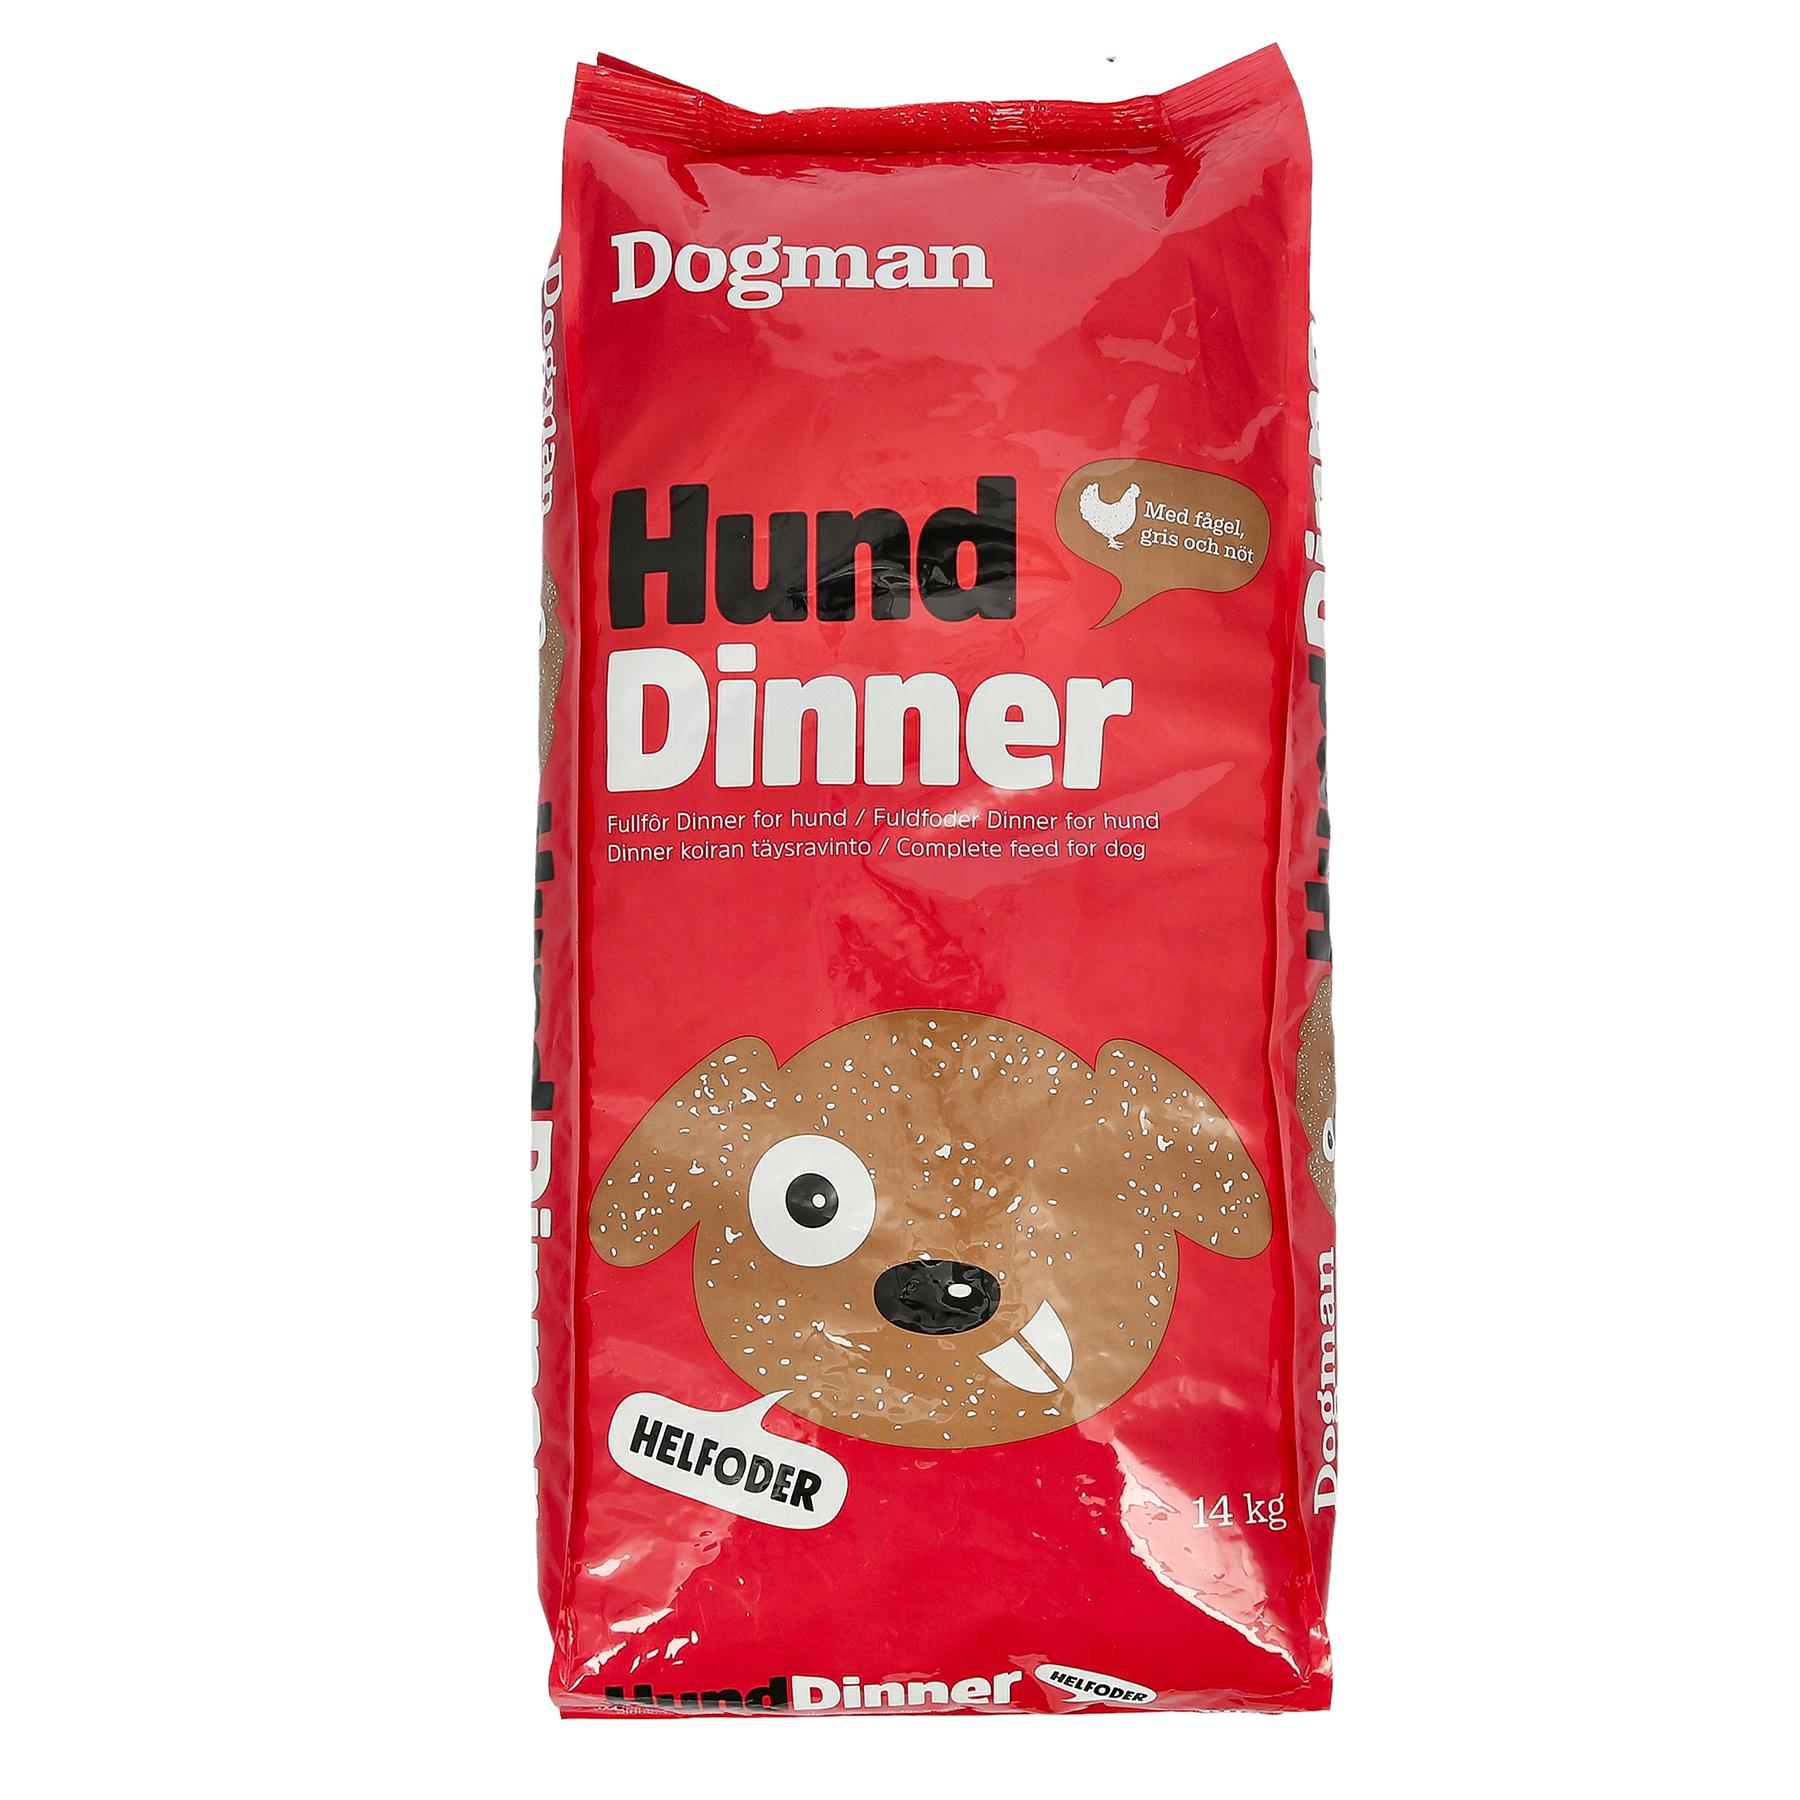 Dogman Dinner 14kg